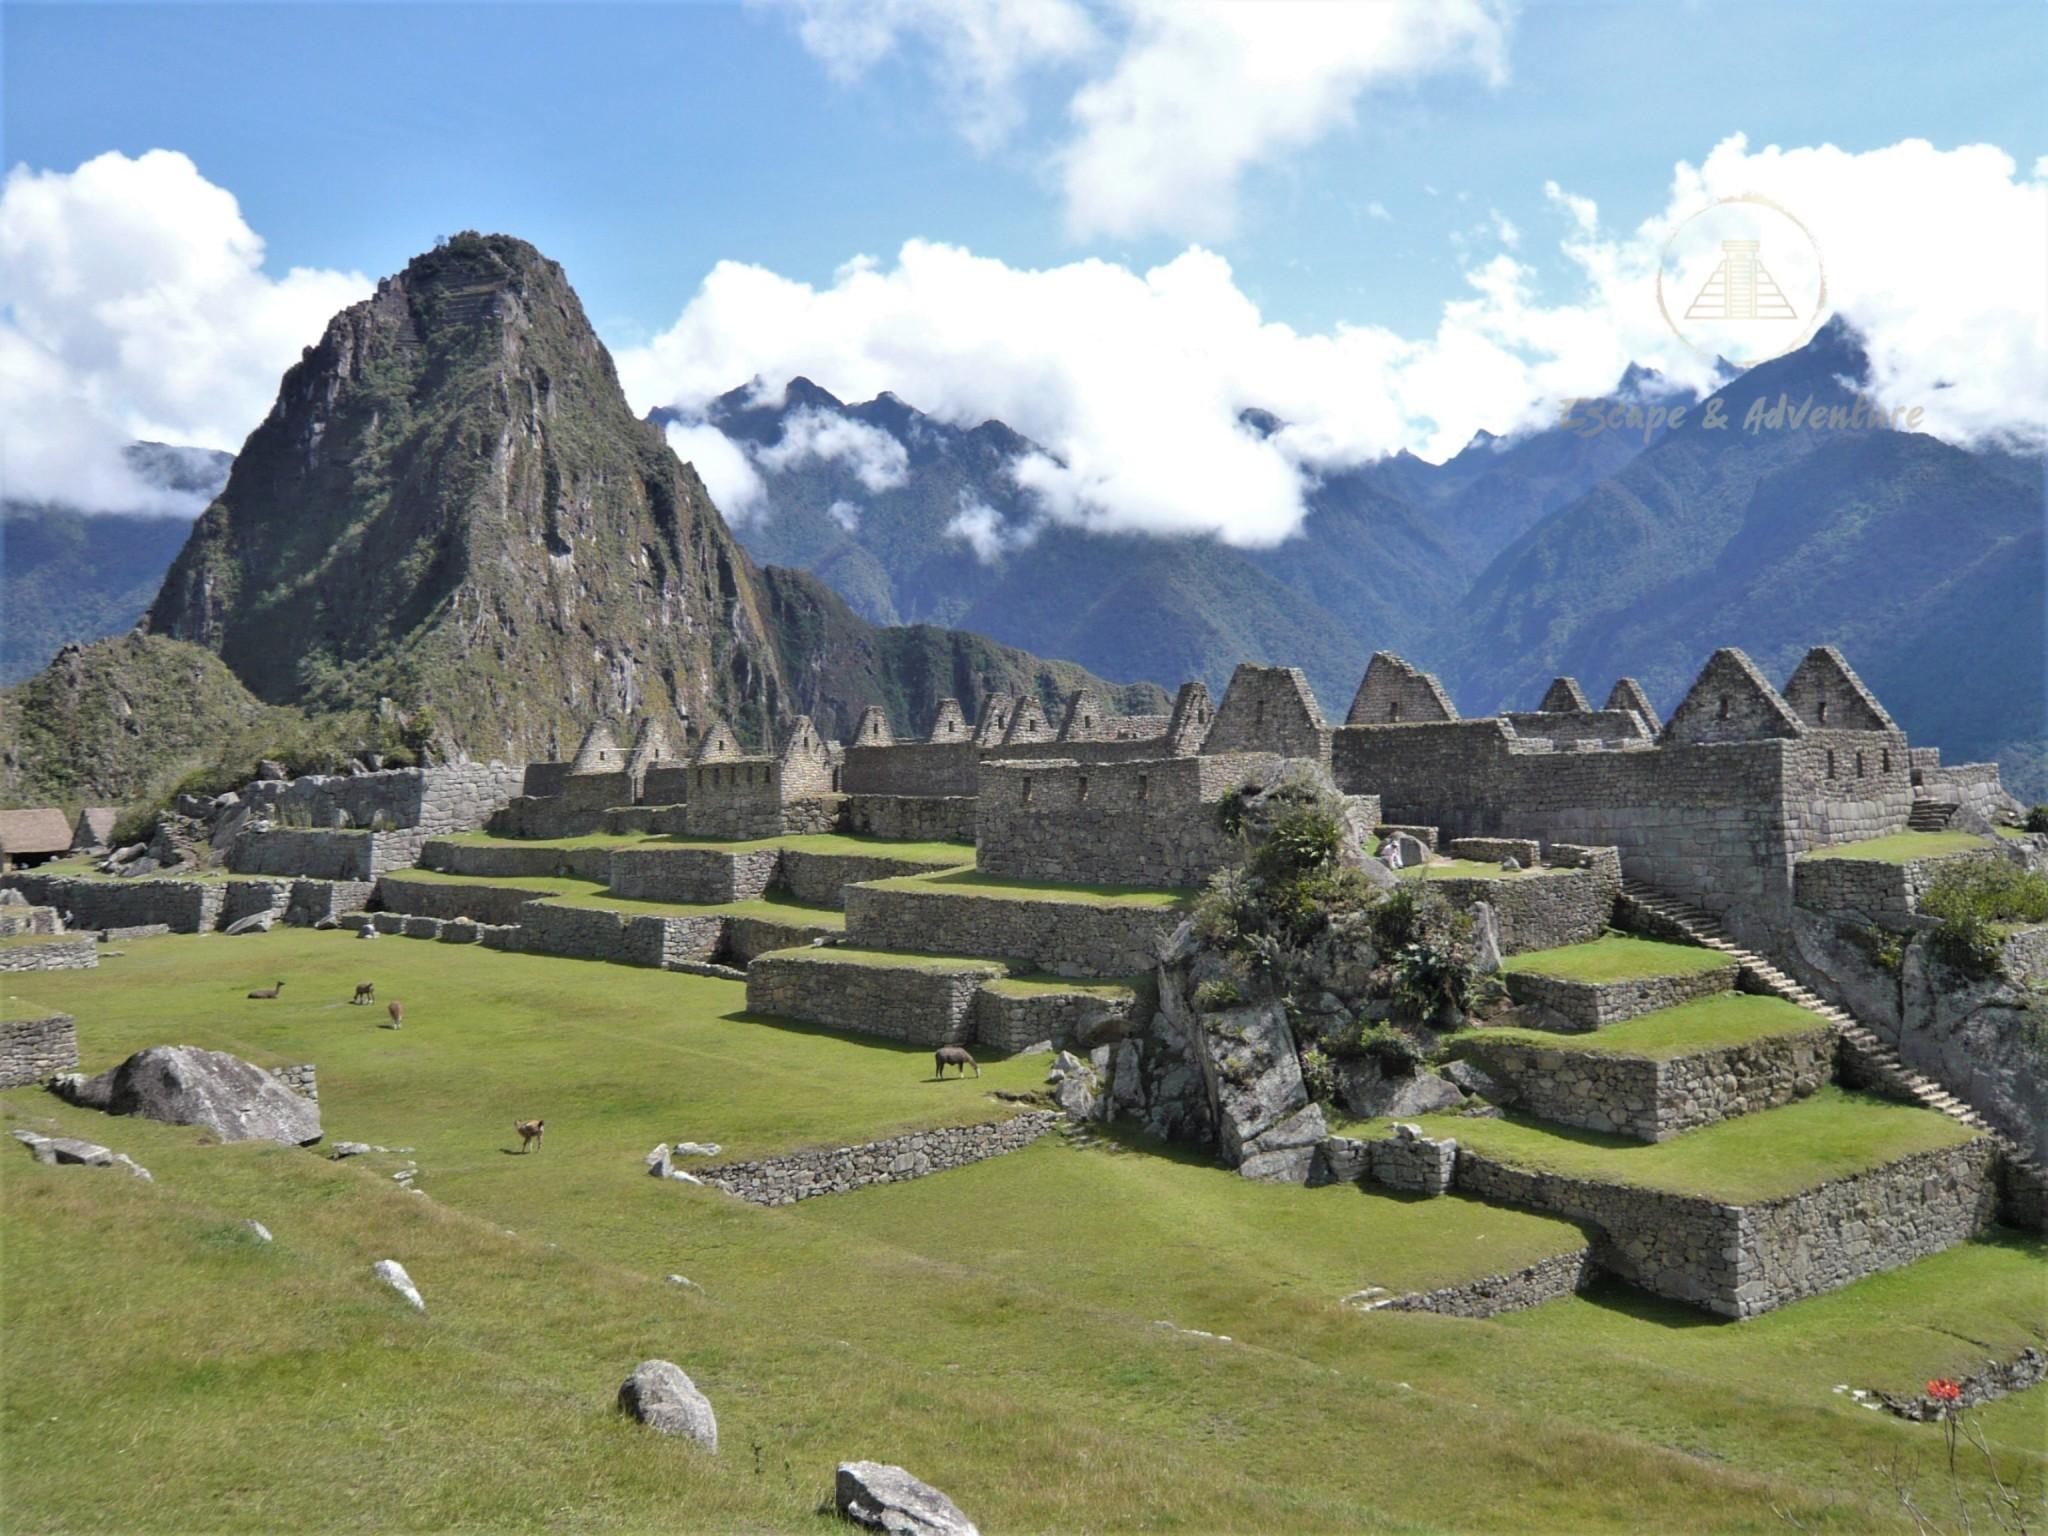 Panorama of Machu Picchu archaeological site and Huayna Picchu mountain peak.